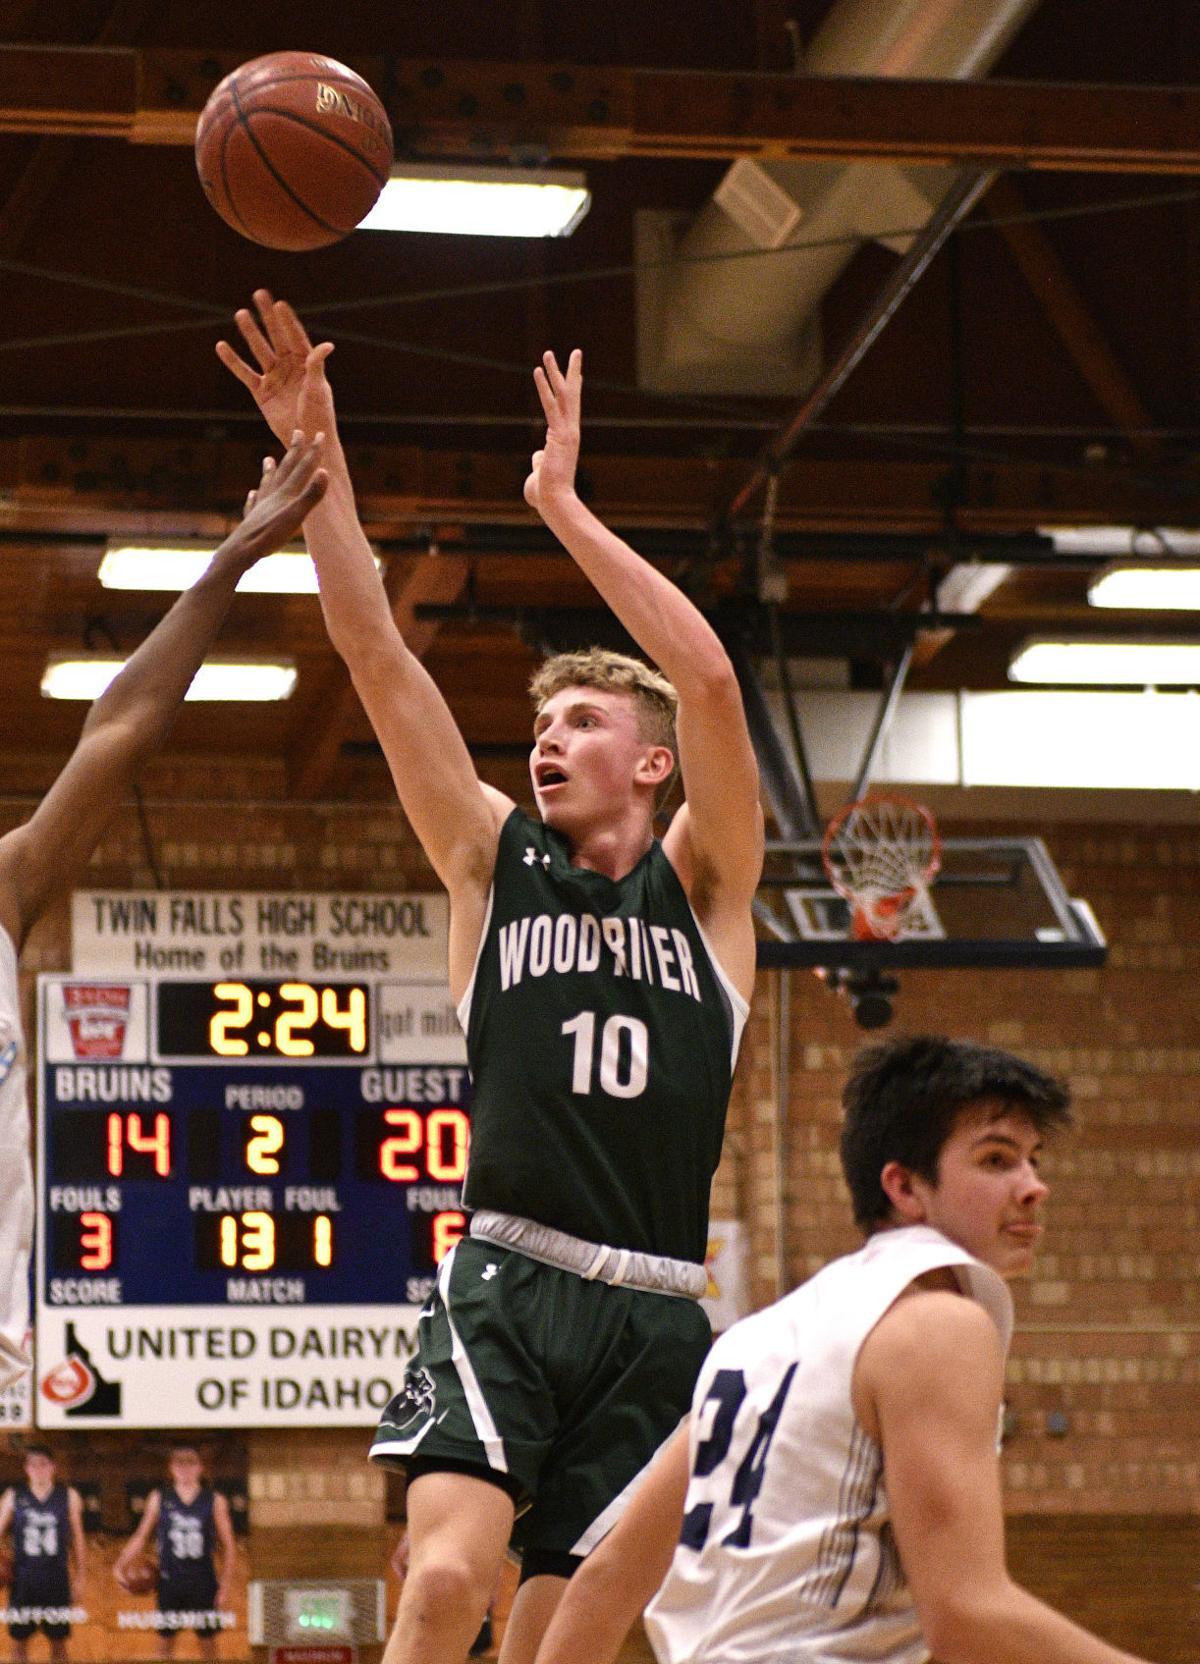 Boys Basketball - Wood River Vs. Twin Falls